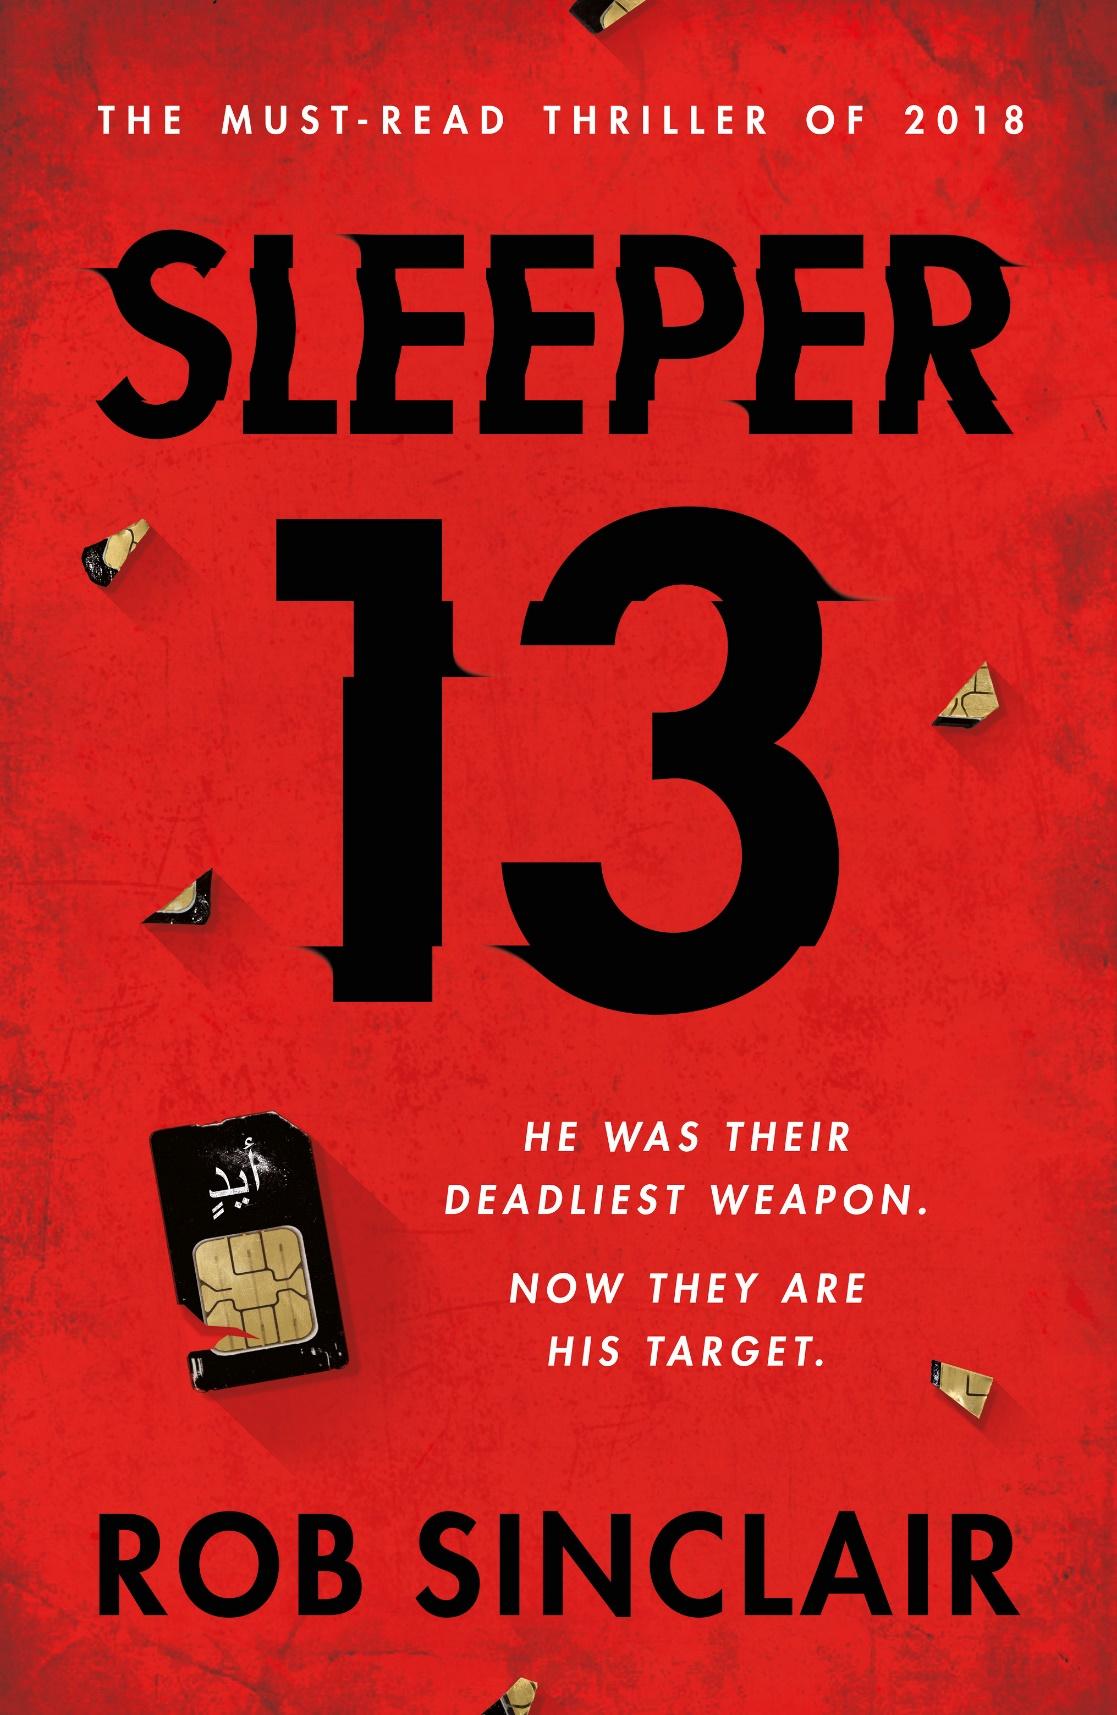 Sleeper 13, Book, Thriller, Rob Sinclair